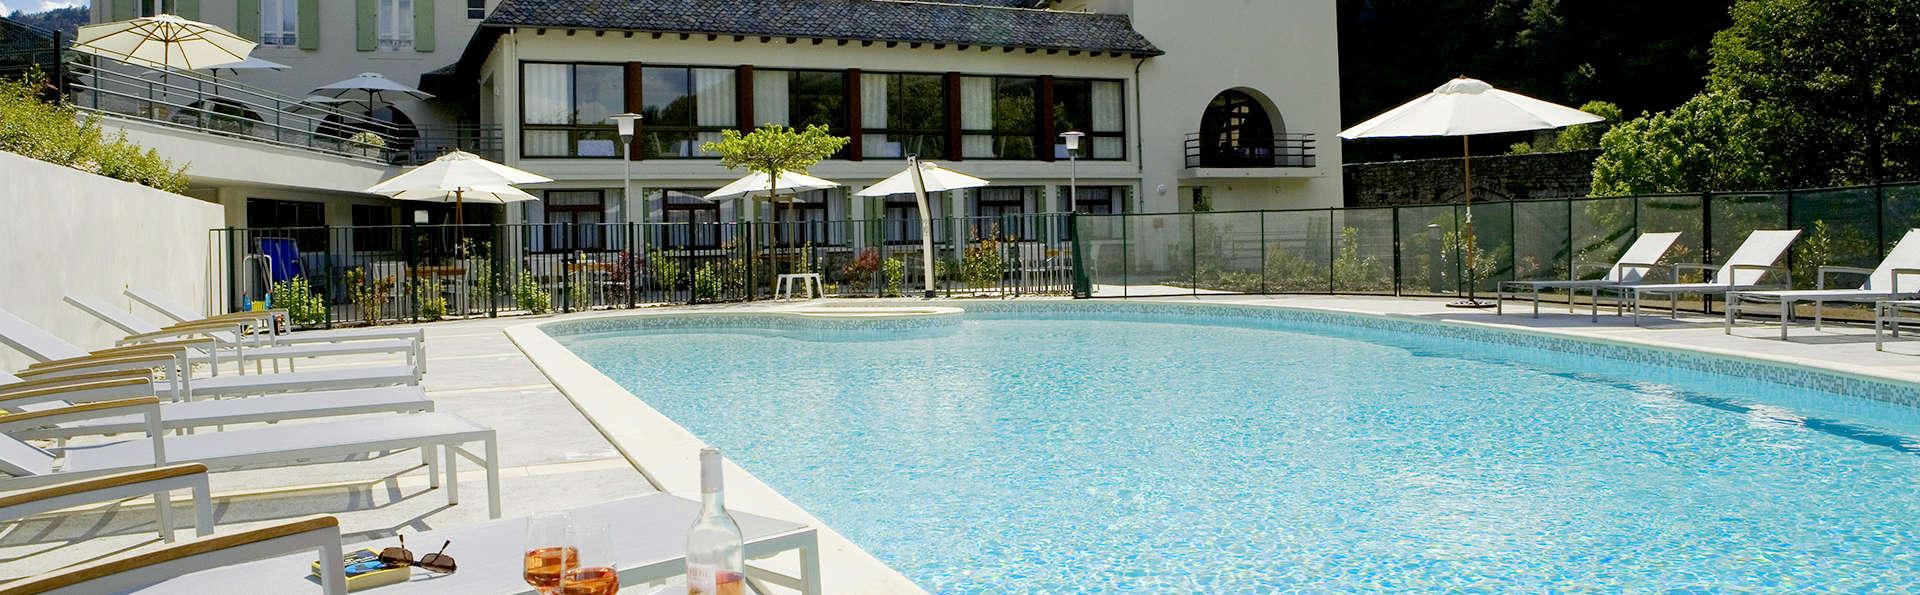 Hôtel la Rivière - Edit_Pool2.jpg